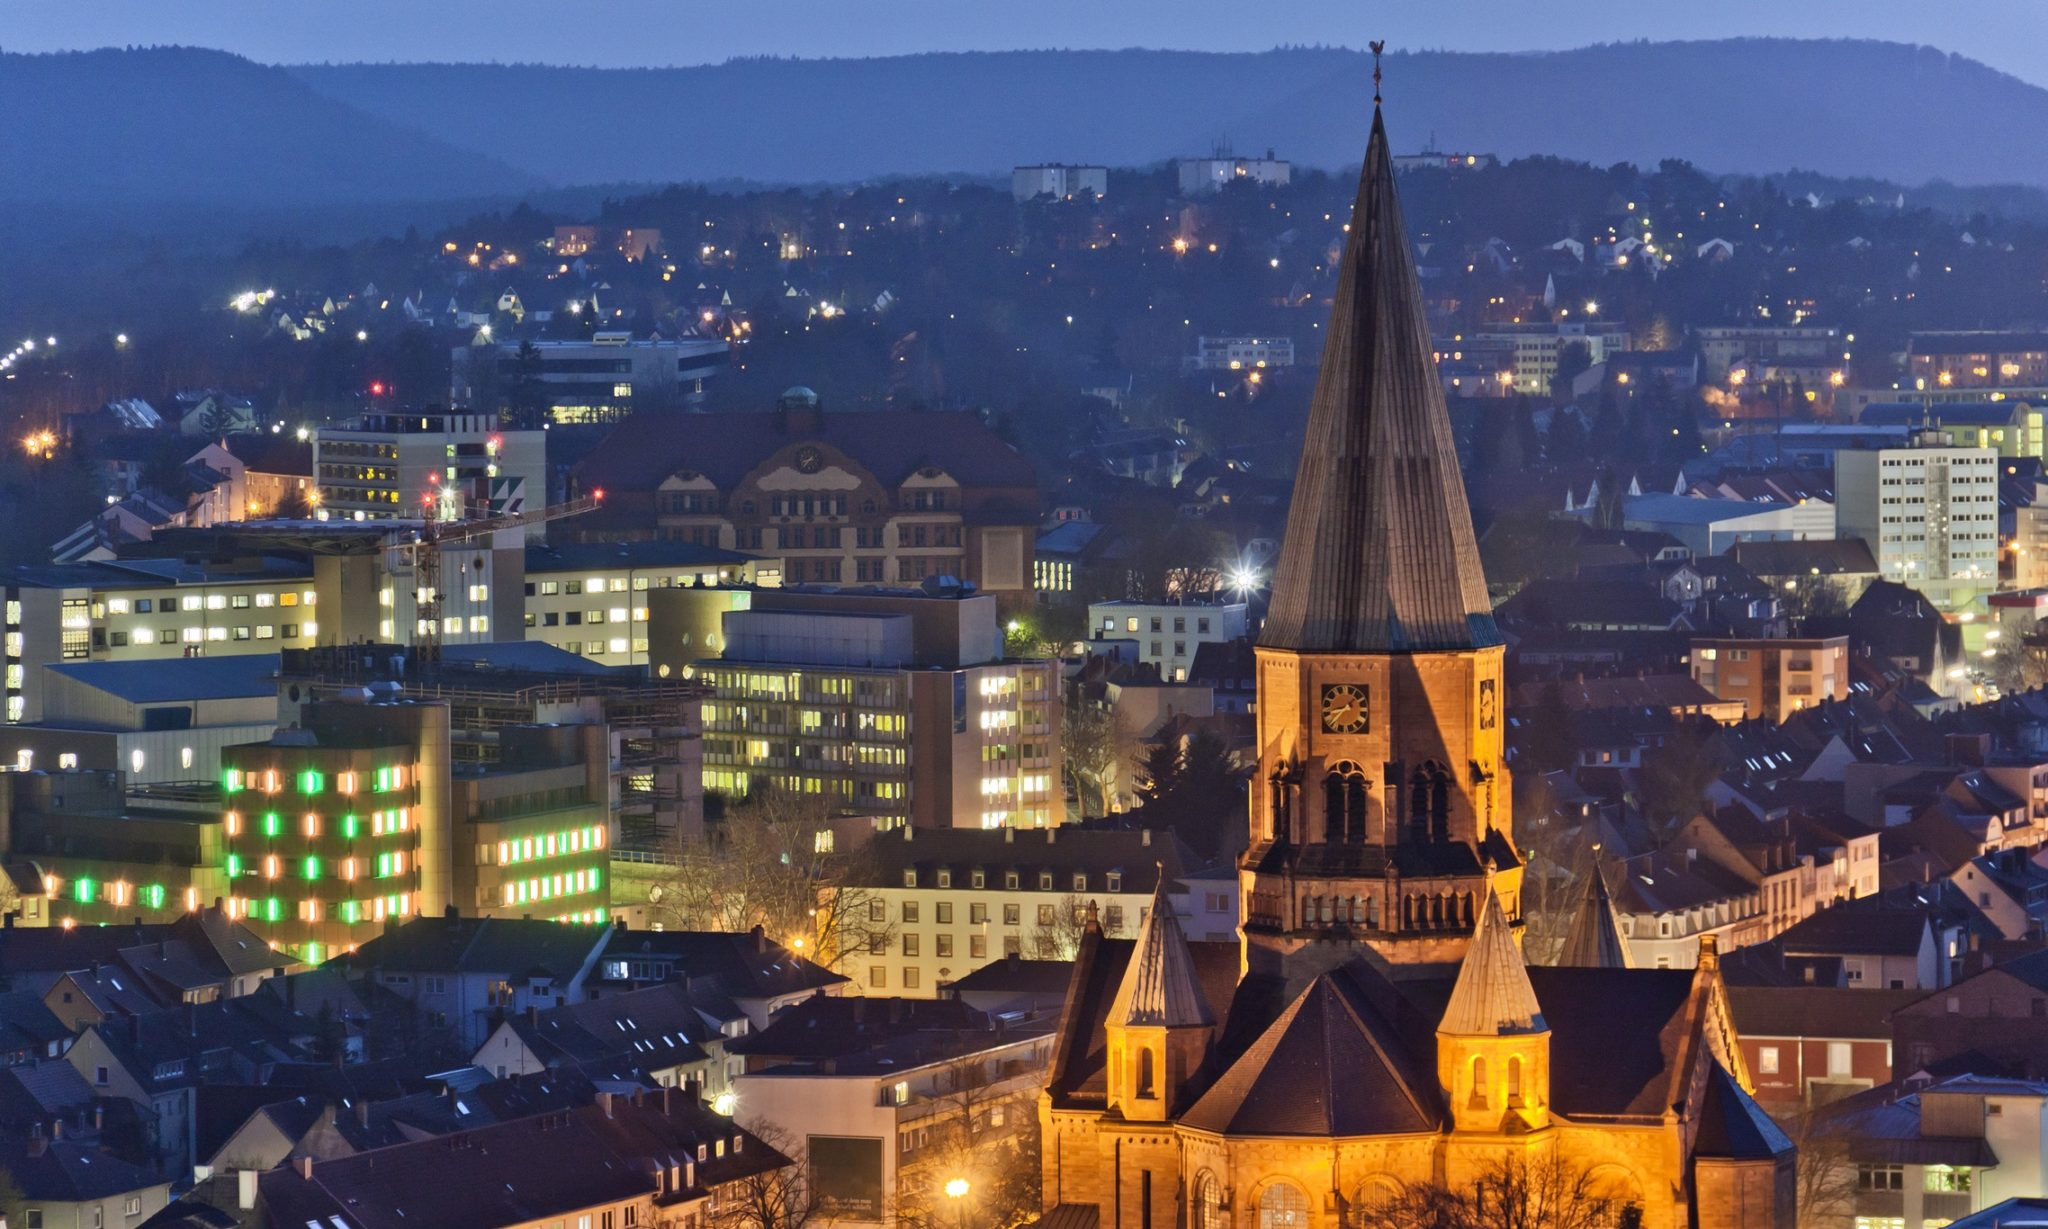 Haushaltsauflösung und Entrümpelung in Kaiserslautern